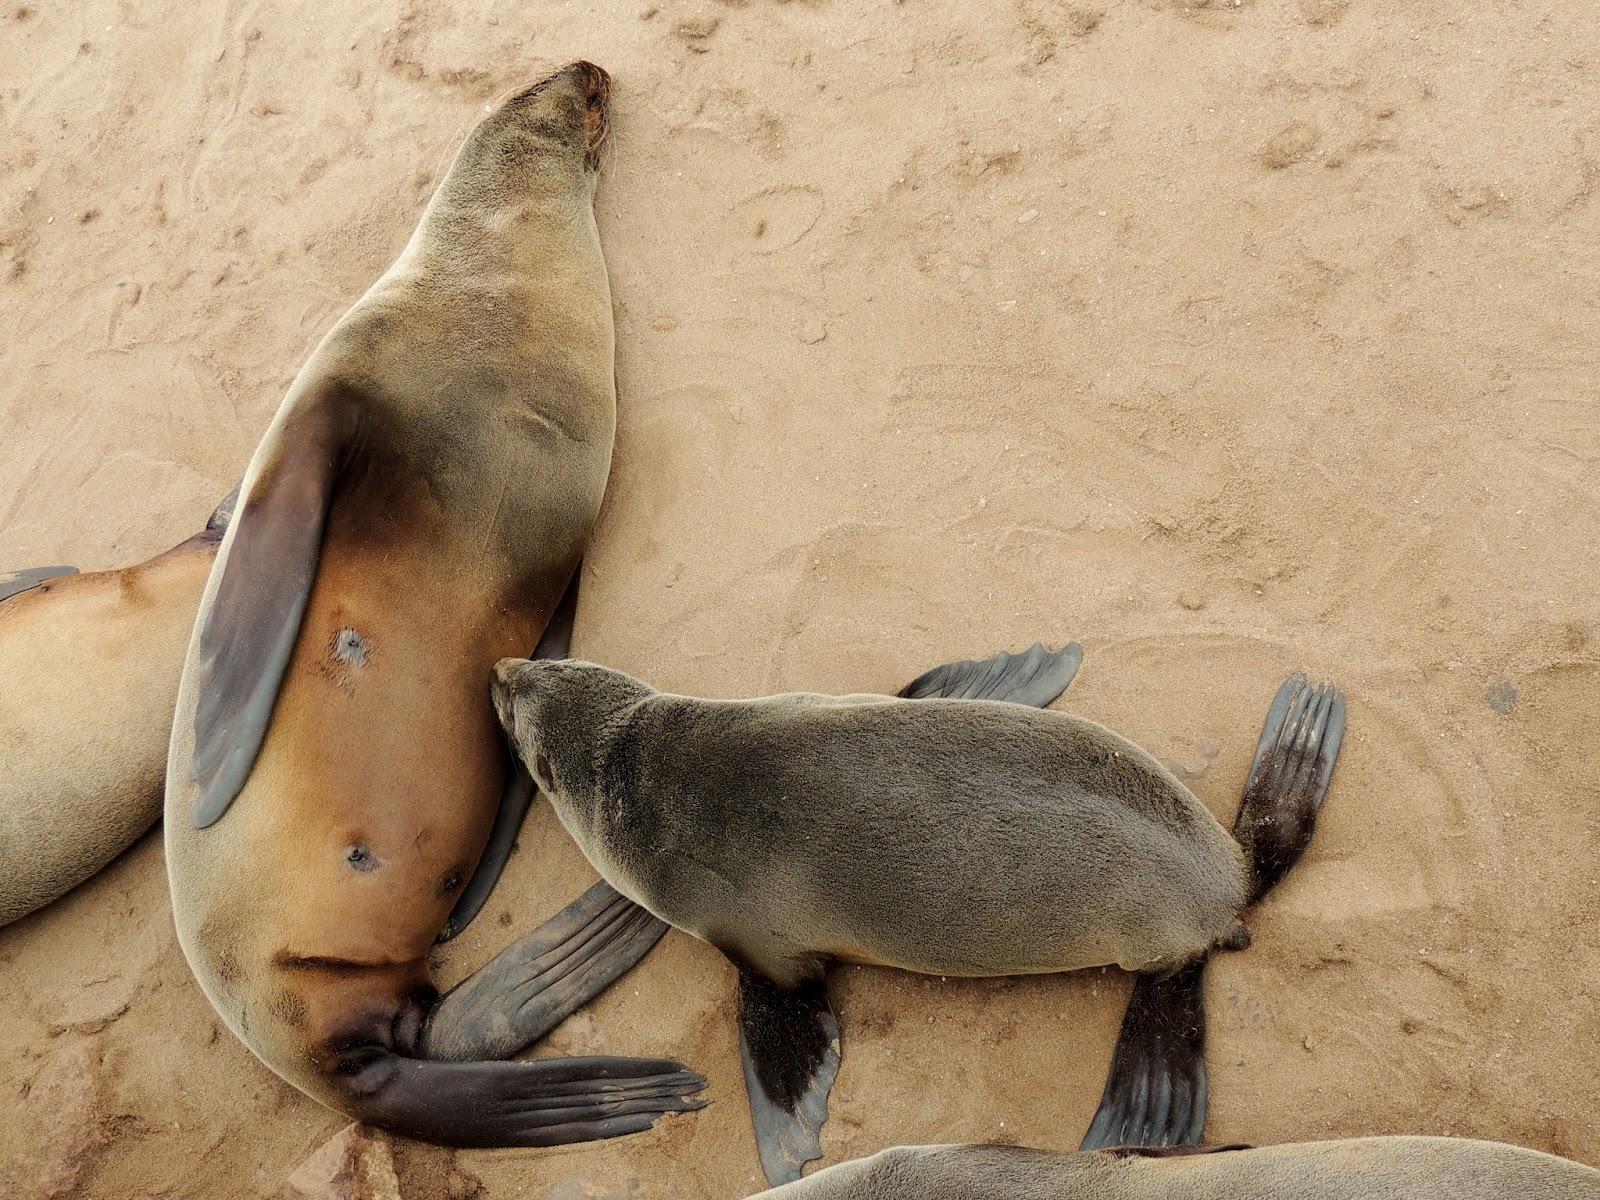 Catalogue Of Organisms Walruses Sea Lions And Fur Seals Harbor Seal Skeleton Diagram Skeletal Anatomy Marine Mammals Suckling South African Arctocephalus Pusillus Copyright Roburq